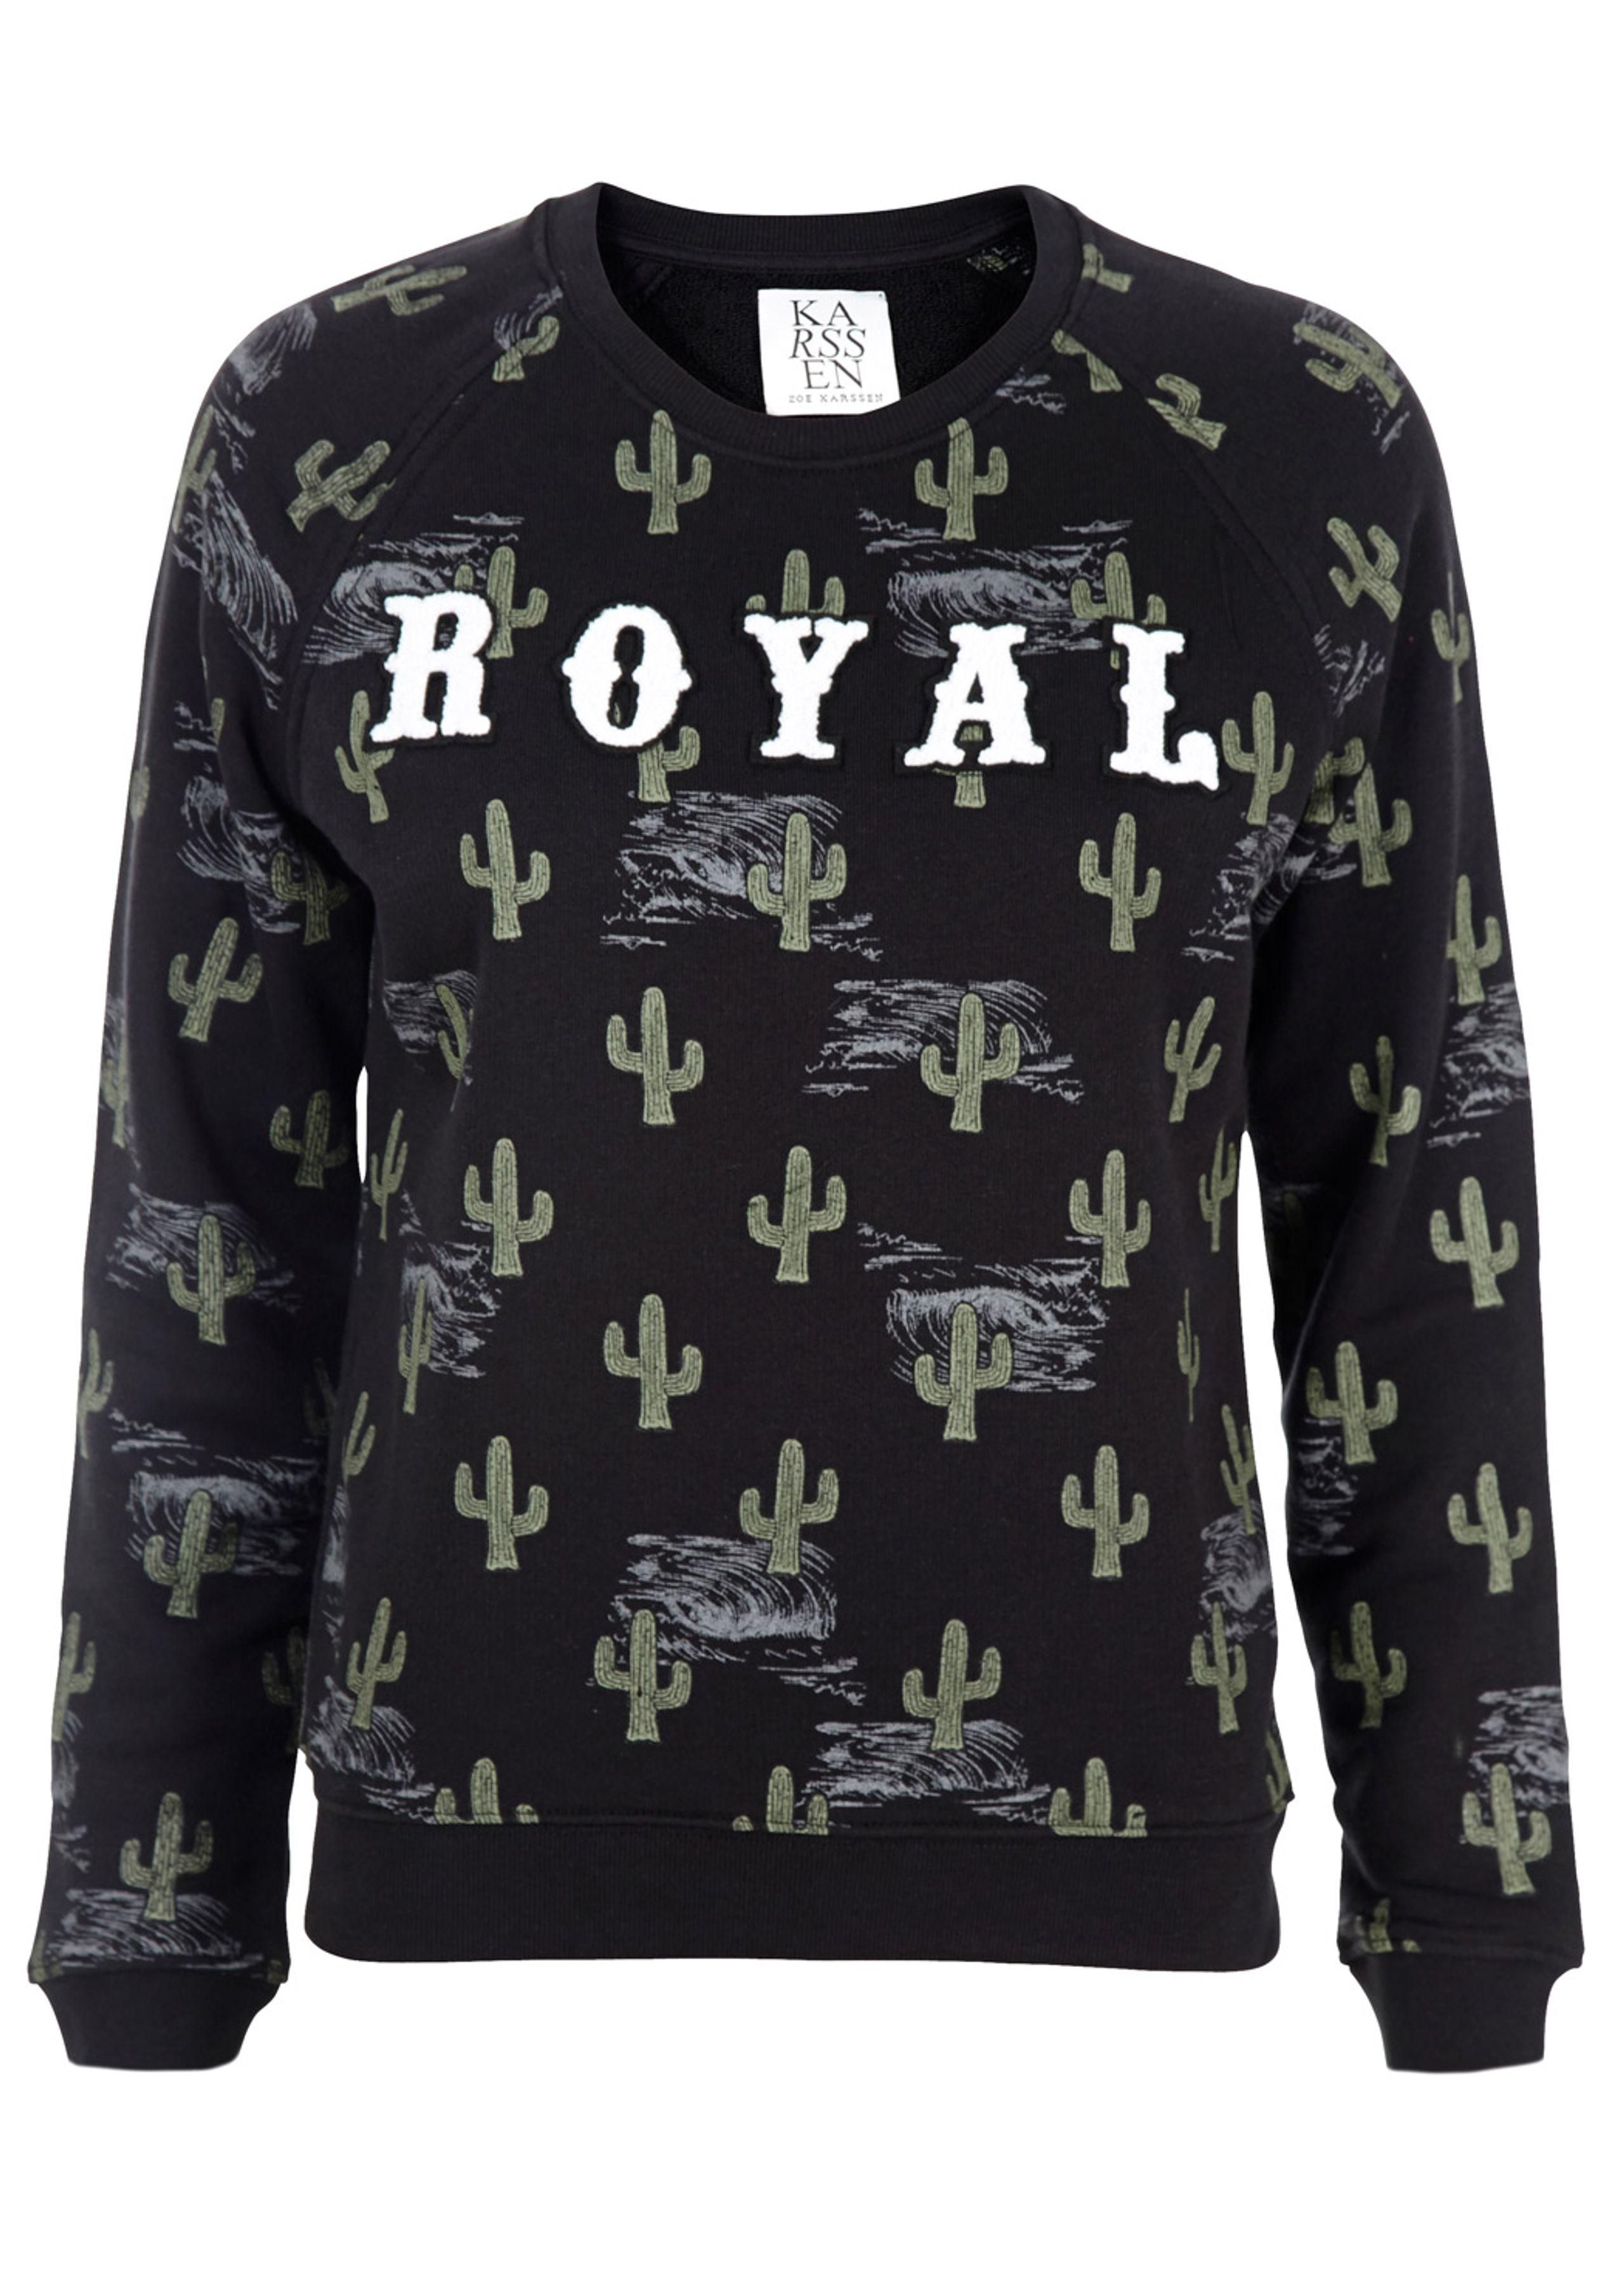 Cactus royal loose sweatshirt